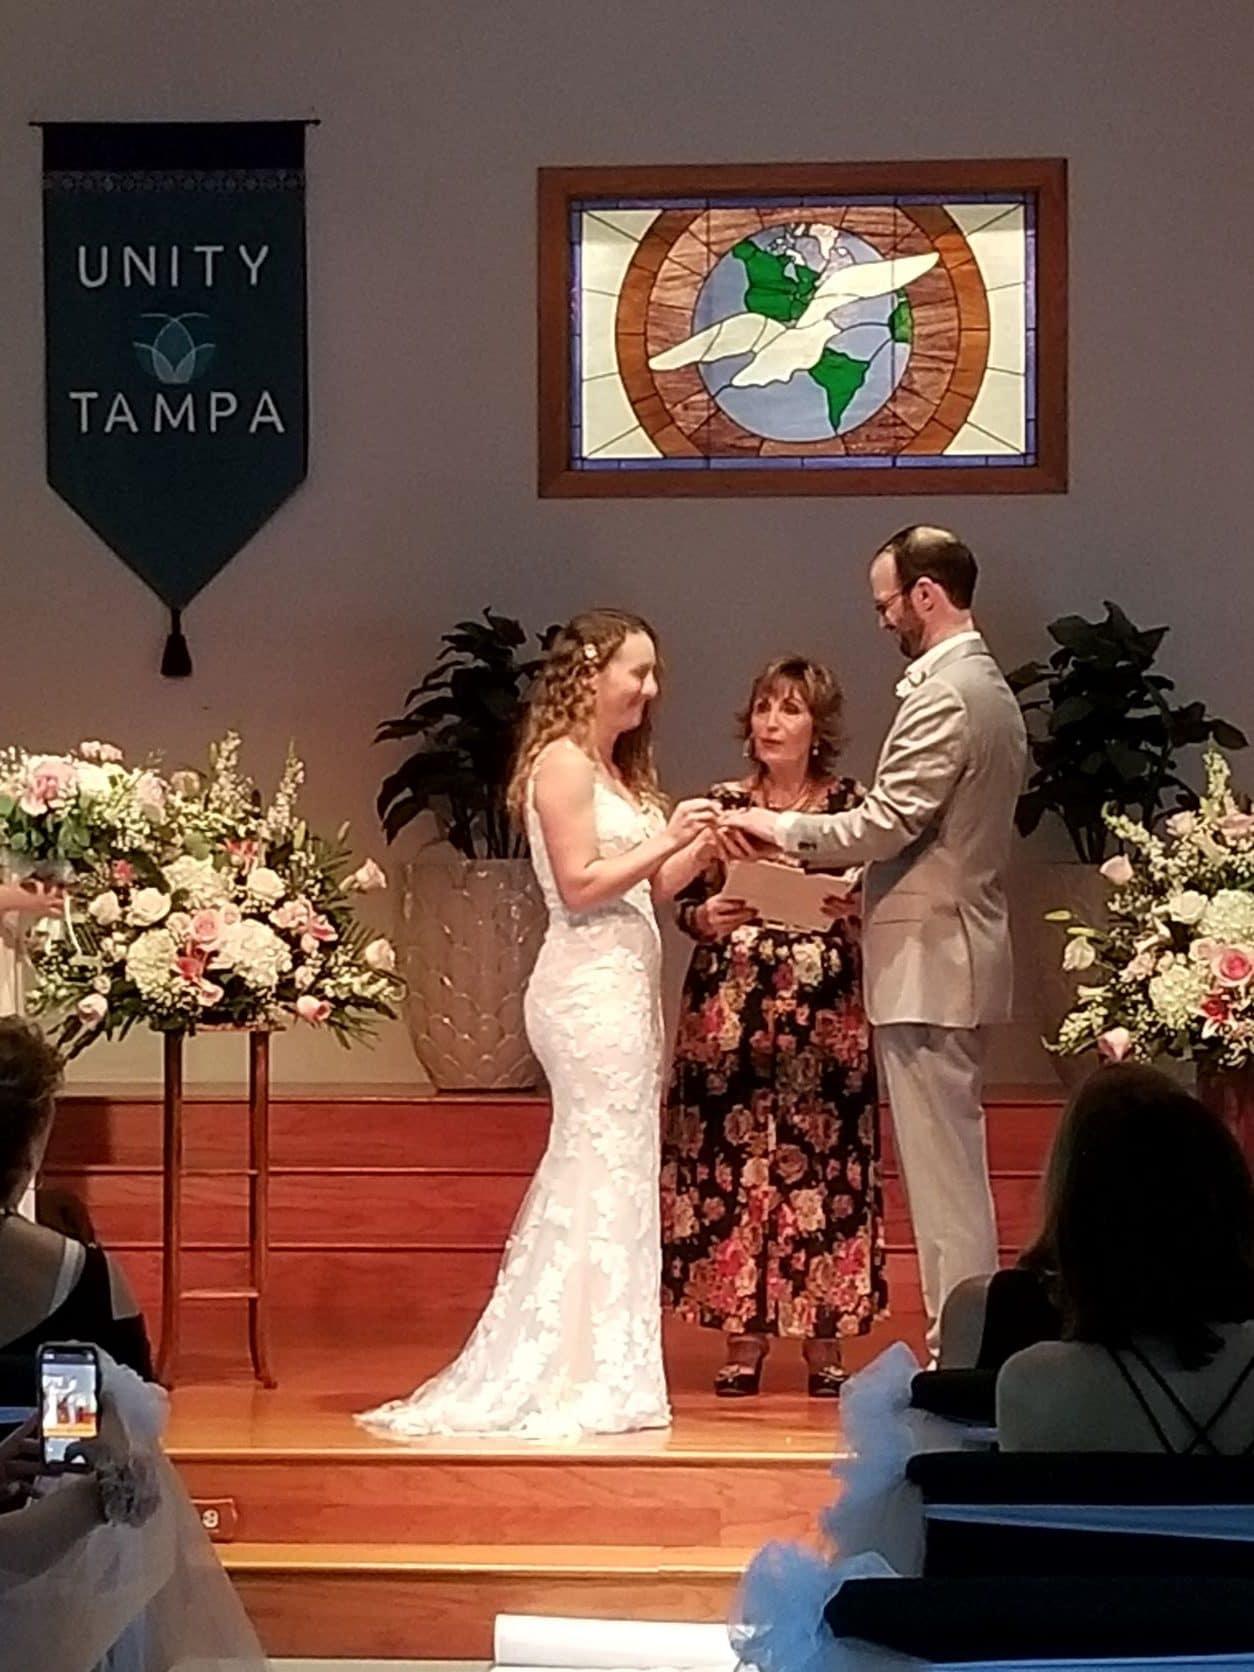 Wedding Unity of Tampa